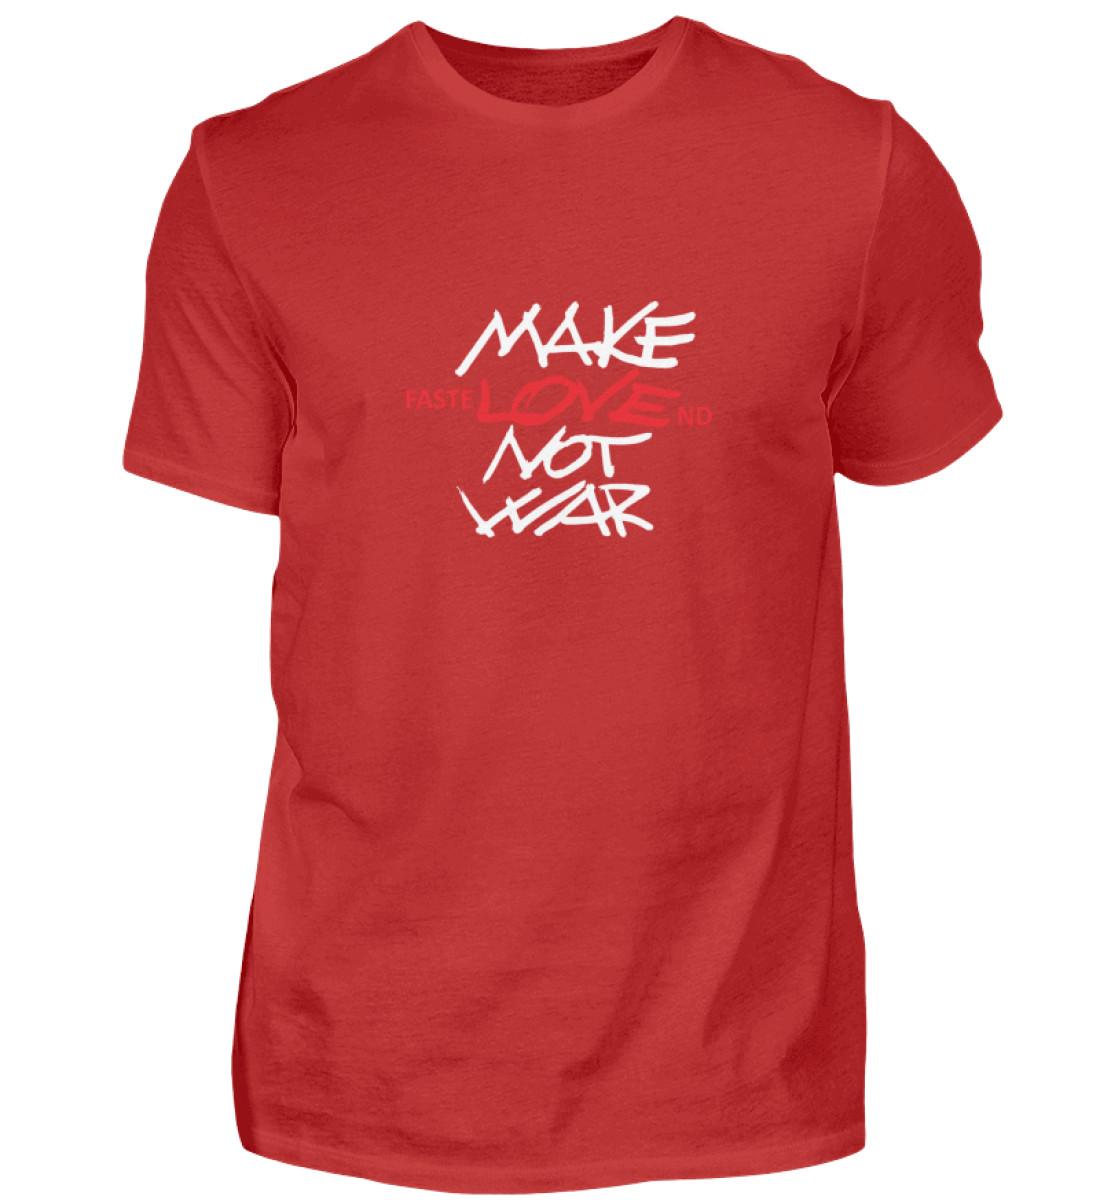 FasteLOVEnd Herren T-Shirt - Herren Shirt-4